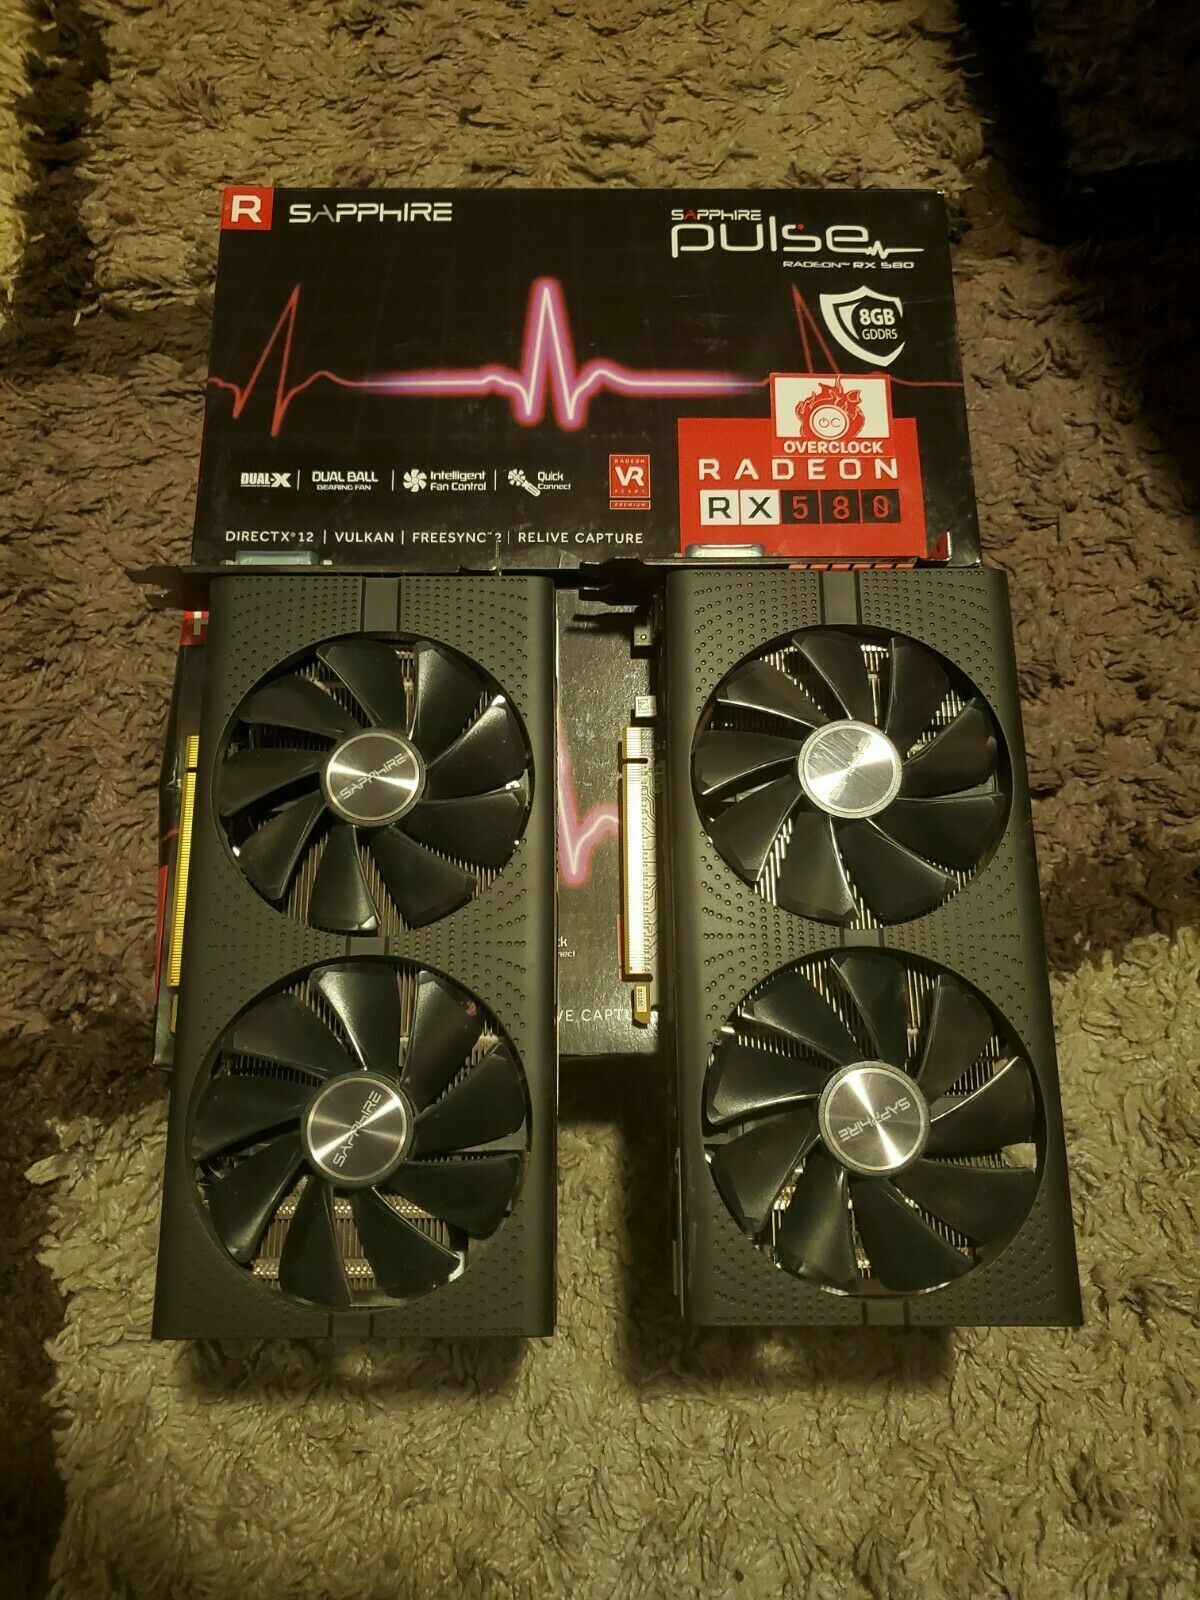 SAPPHIRE Pulse Radeon RX 580 8gb Gddr5 graphics card...